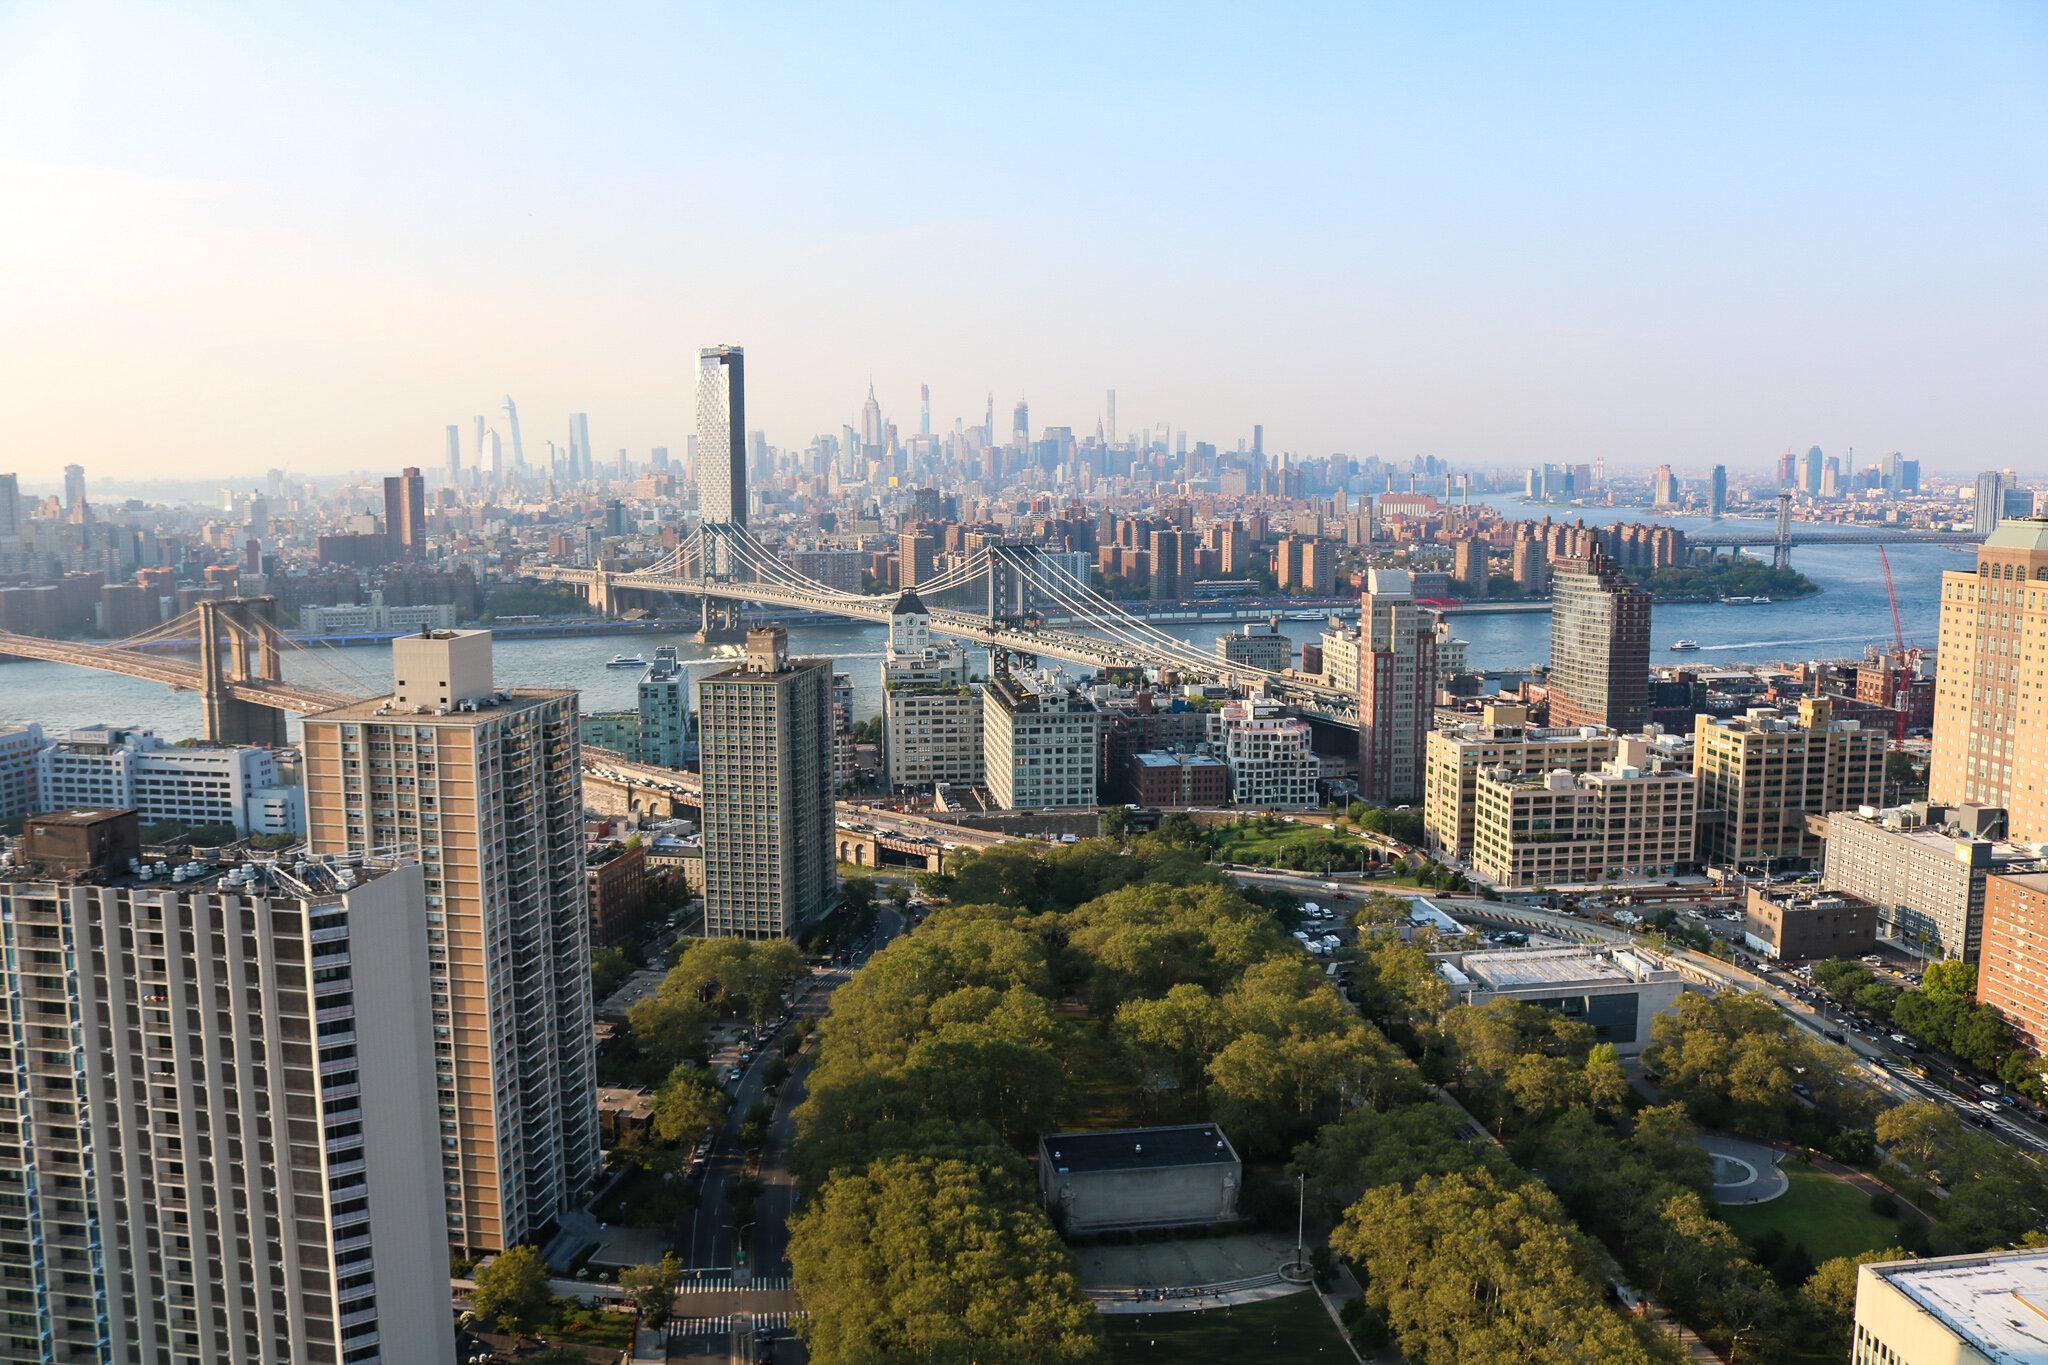 NYC Urbanism, 2019